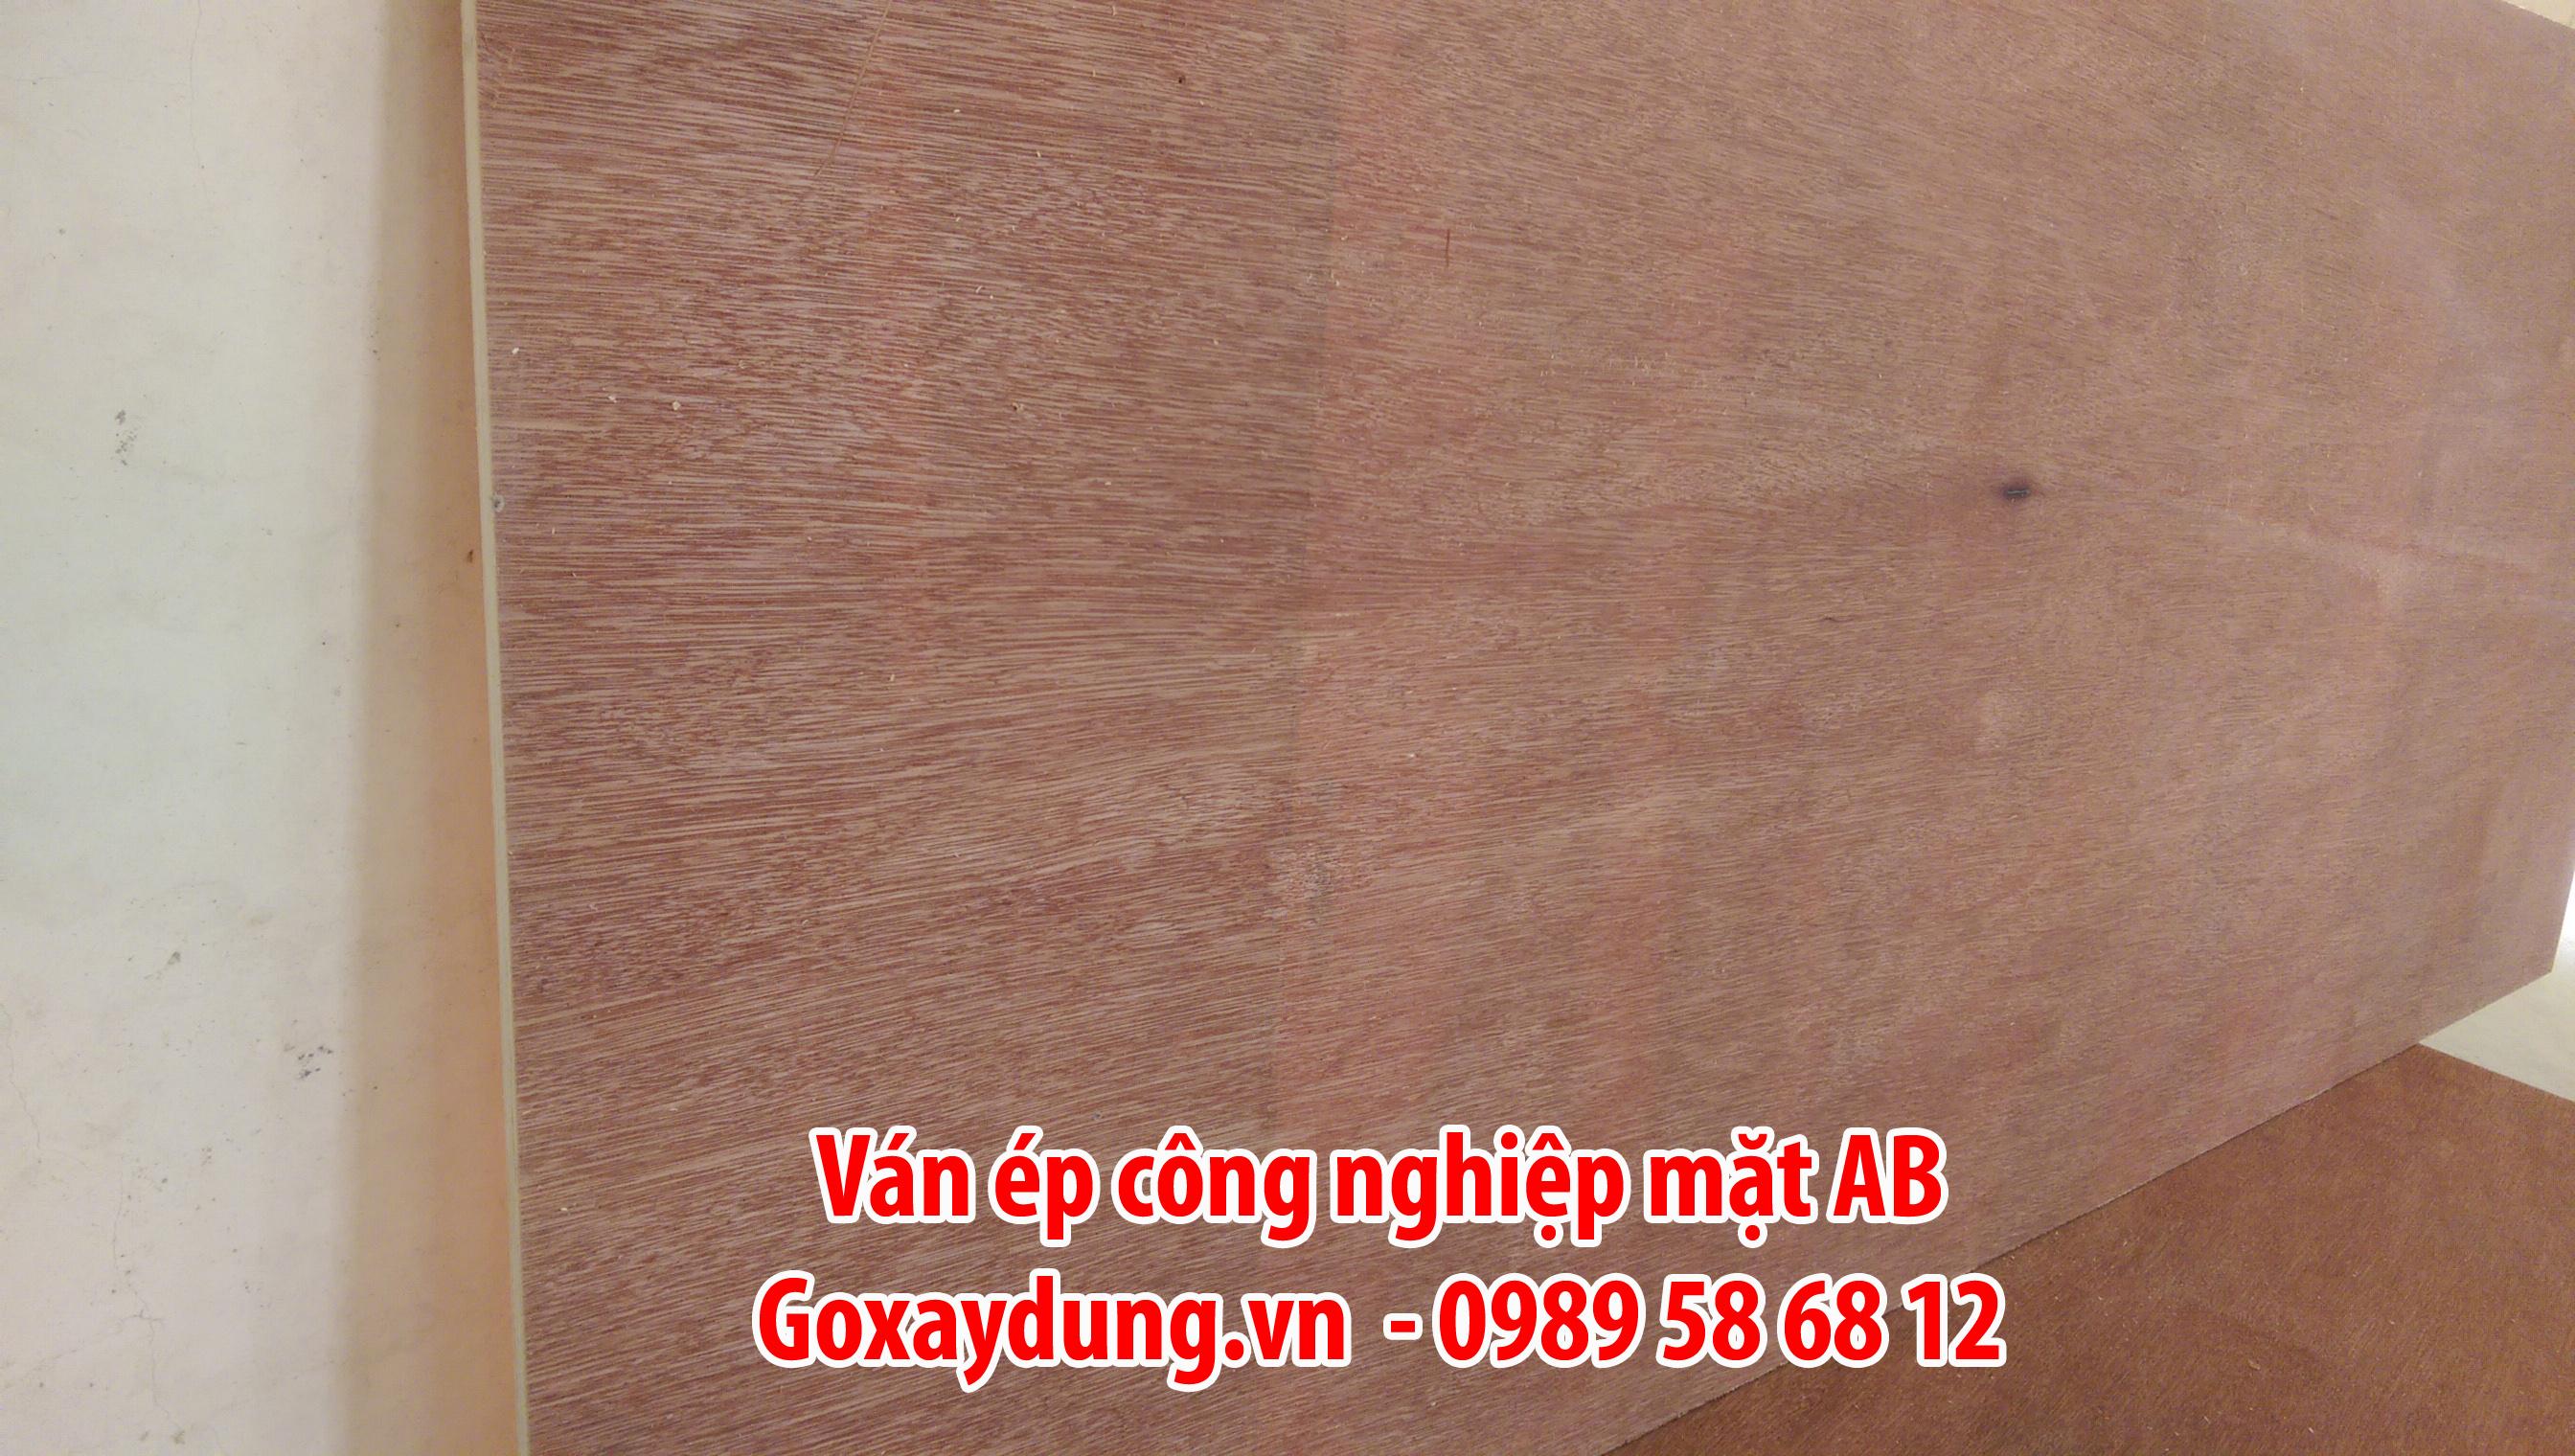 van-p-cong-nghiep-ab-goxaydung-2.jpg